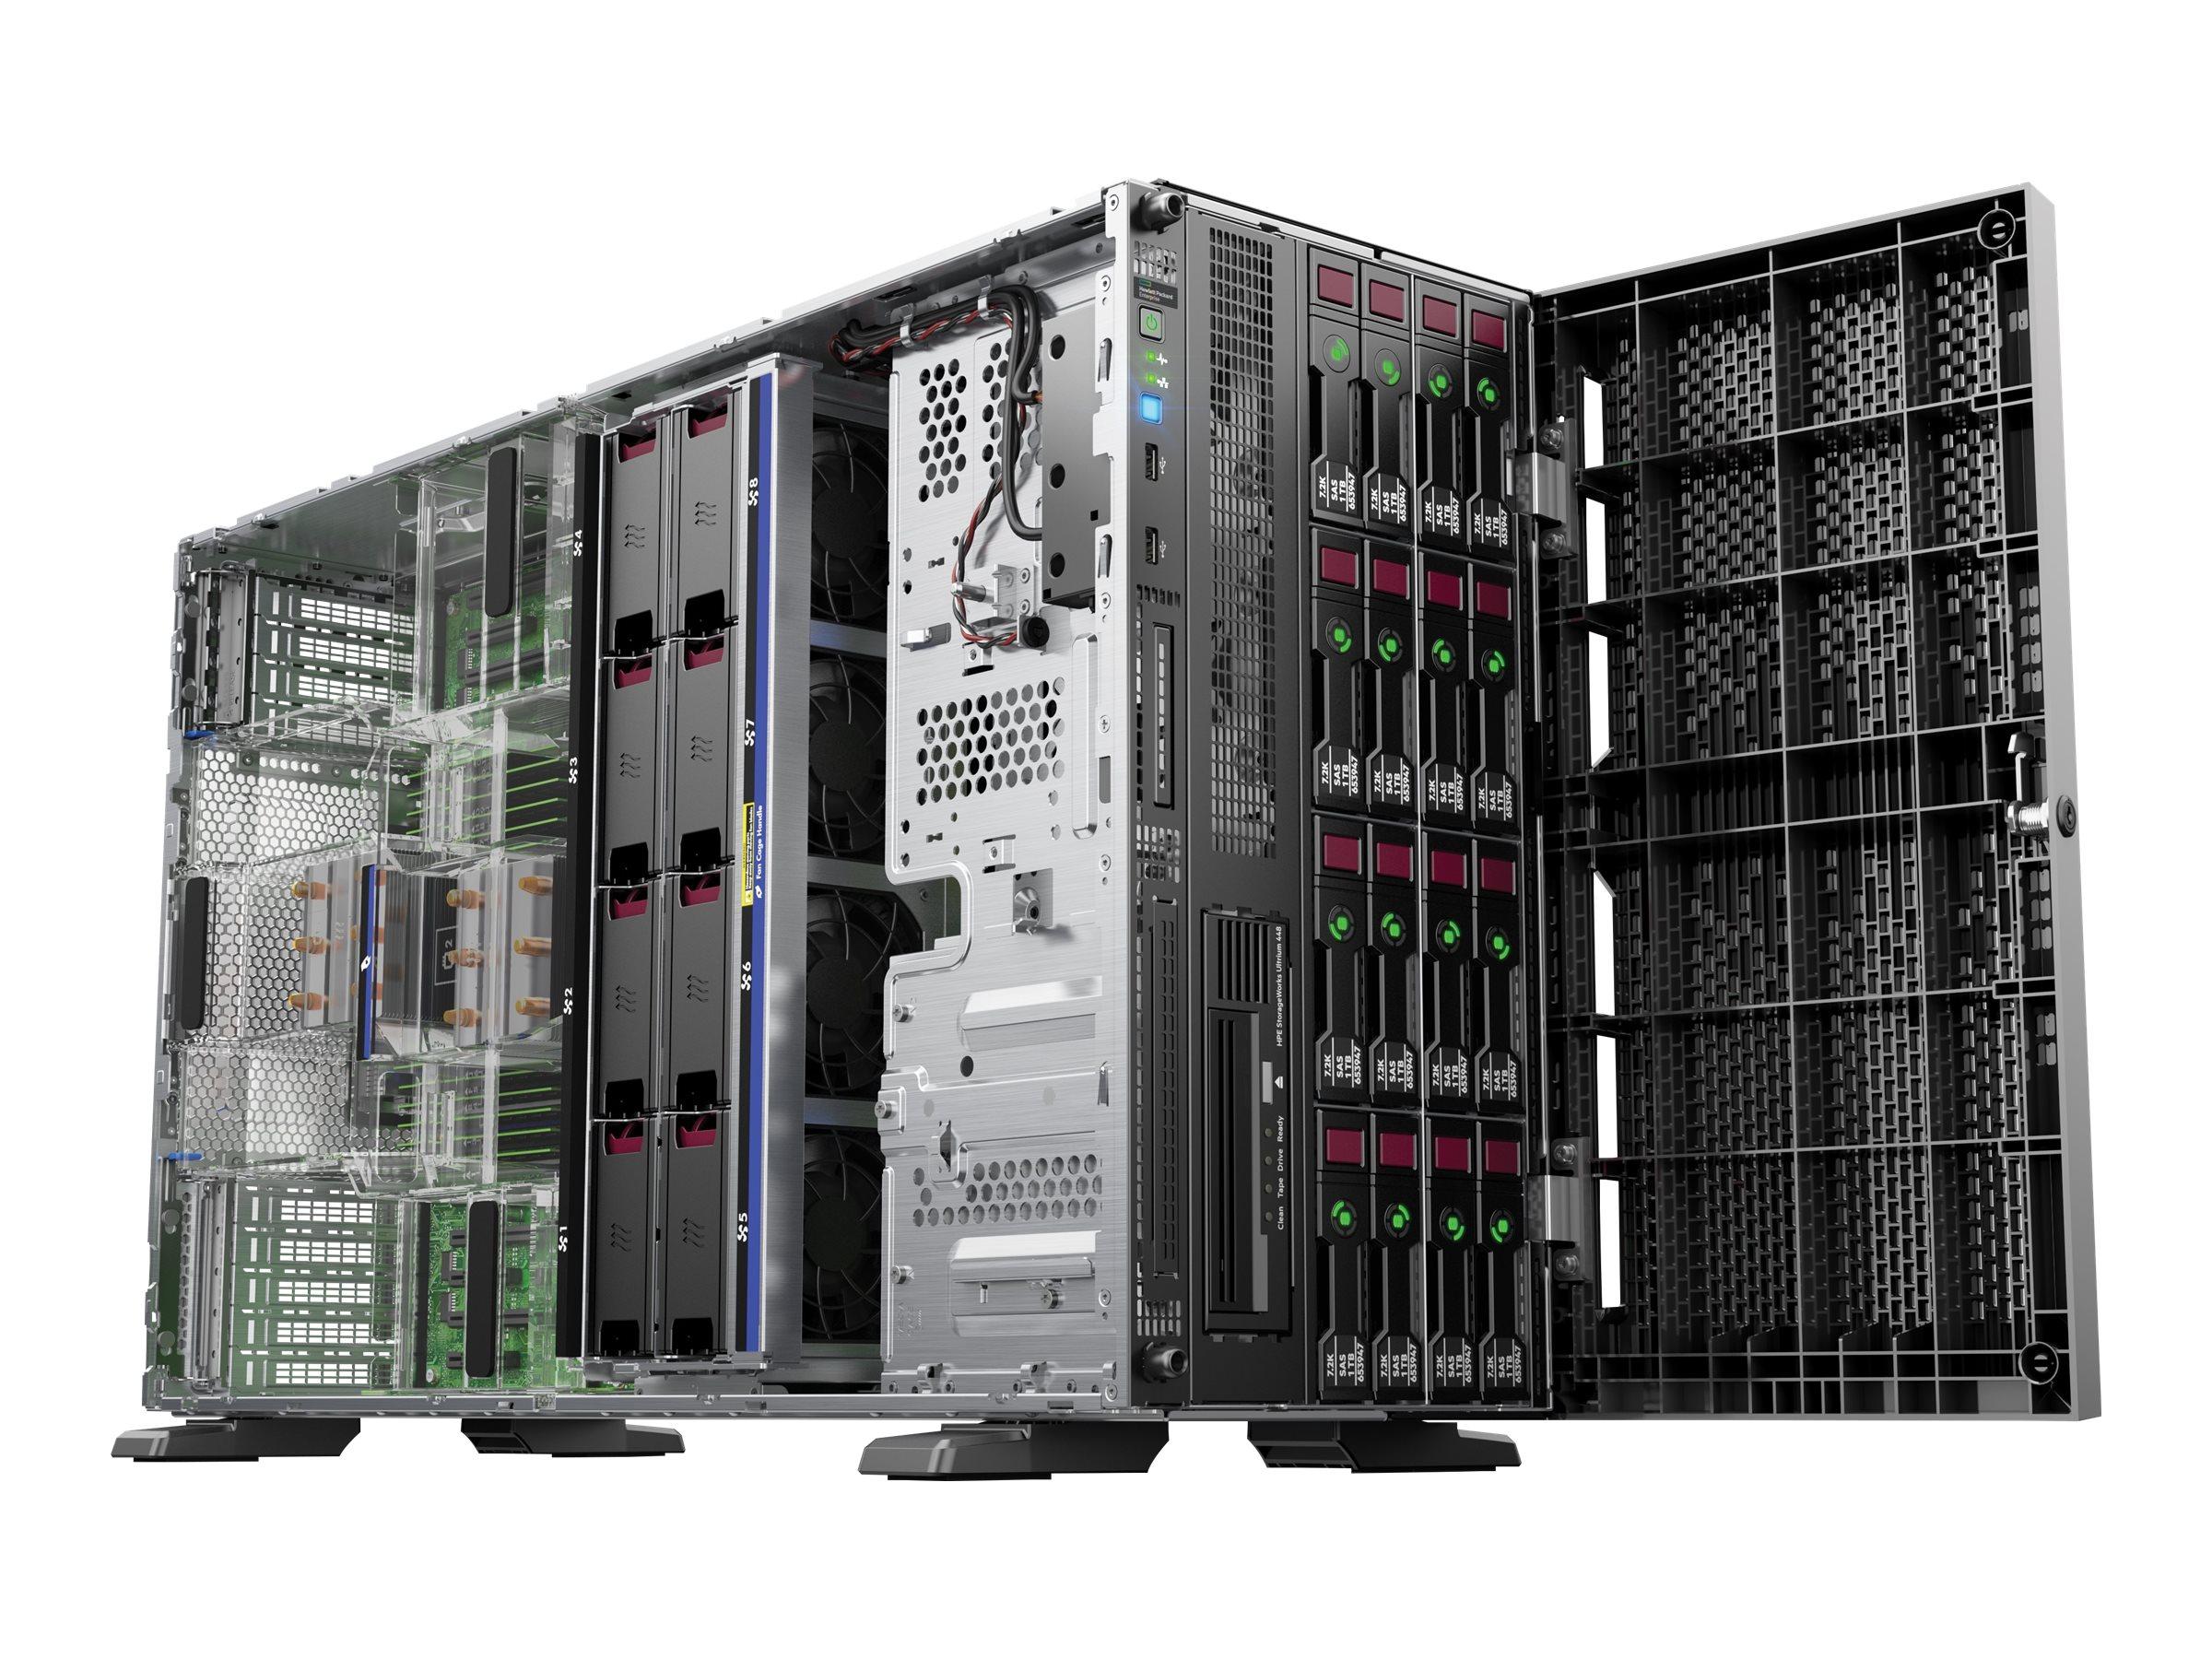 HPE ML350 Gen9 E5-2650v3 SFF EU Svr (765822-421) - REFURB